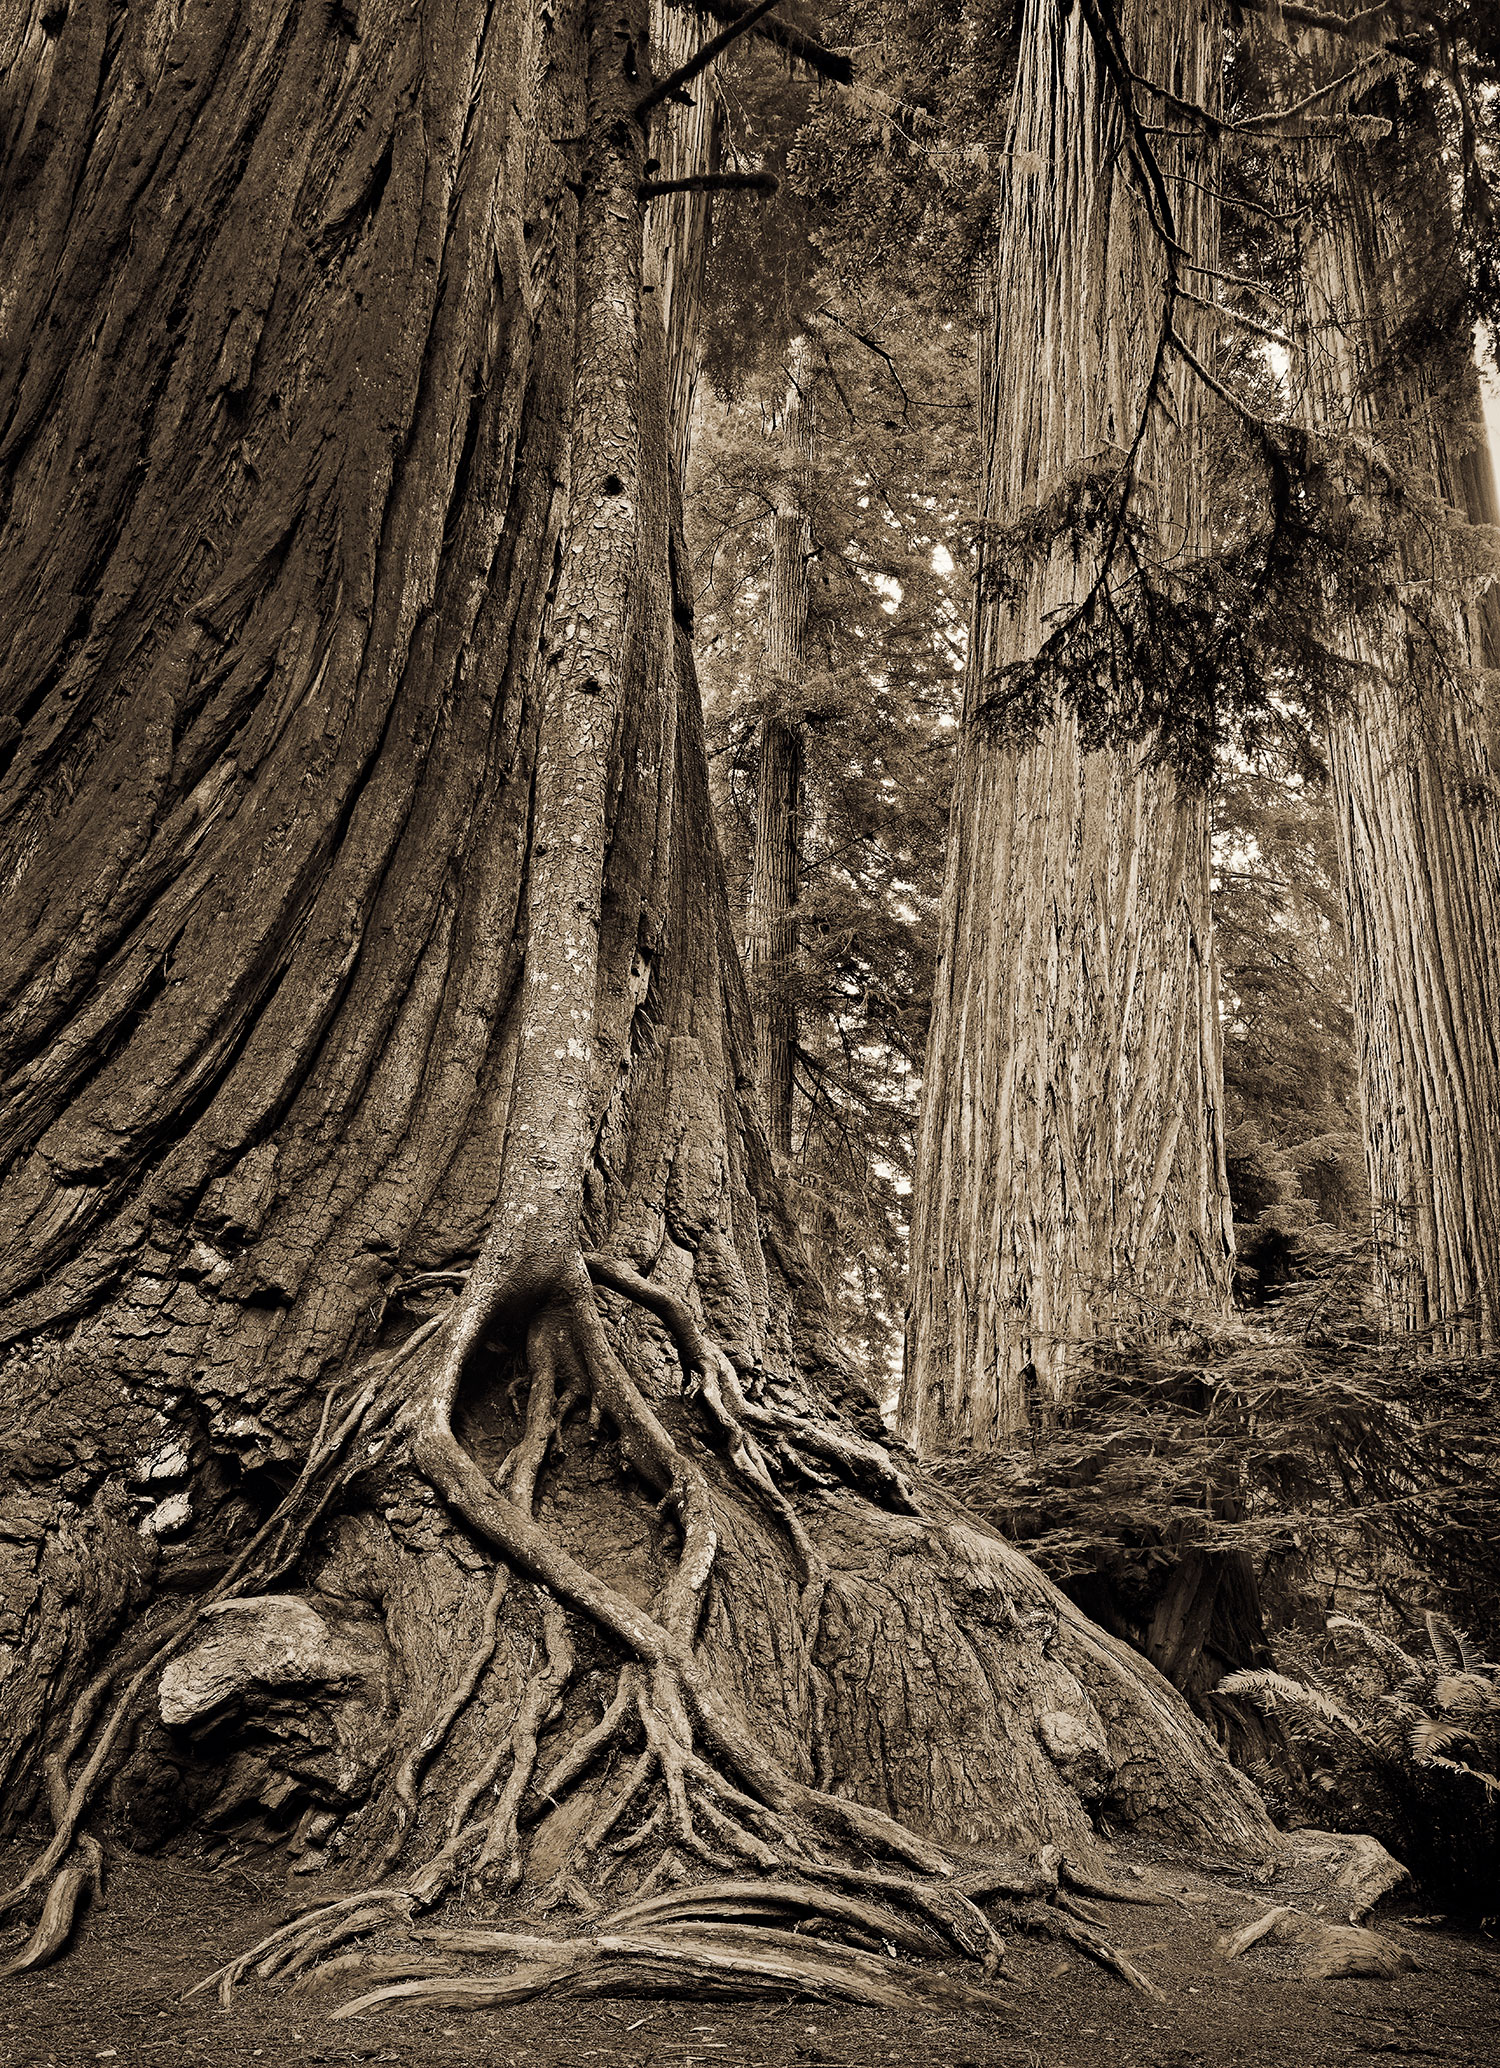 redwood-roots4.jpg